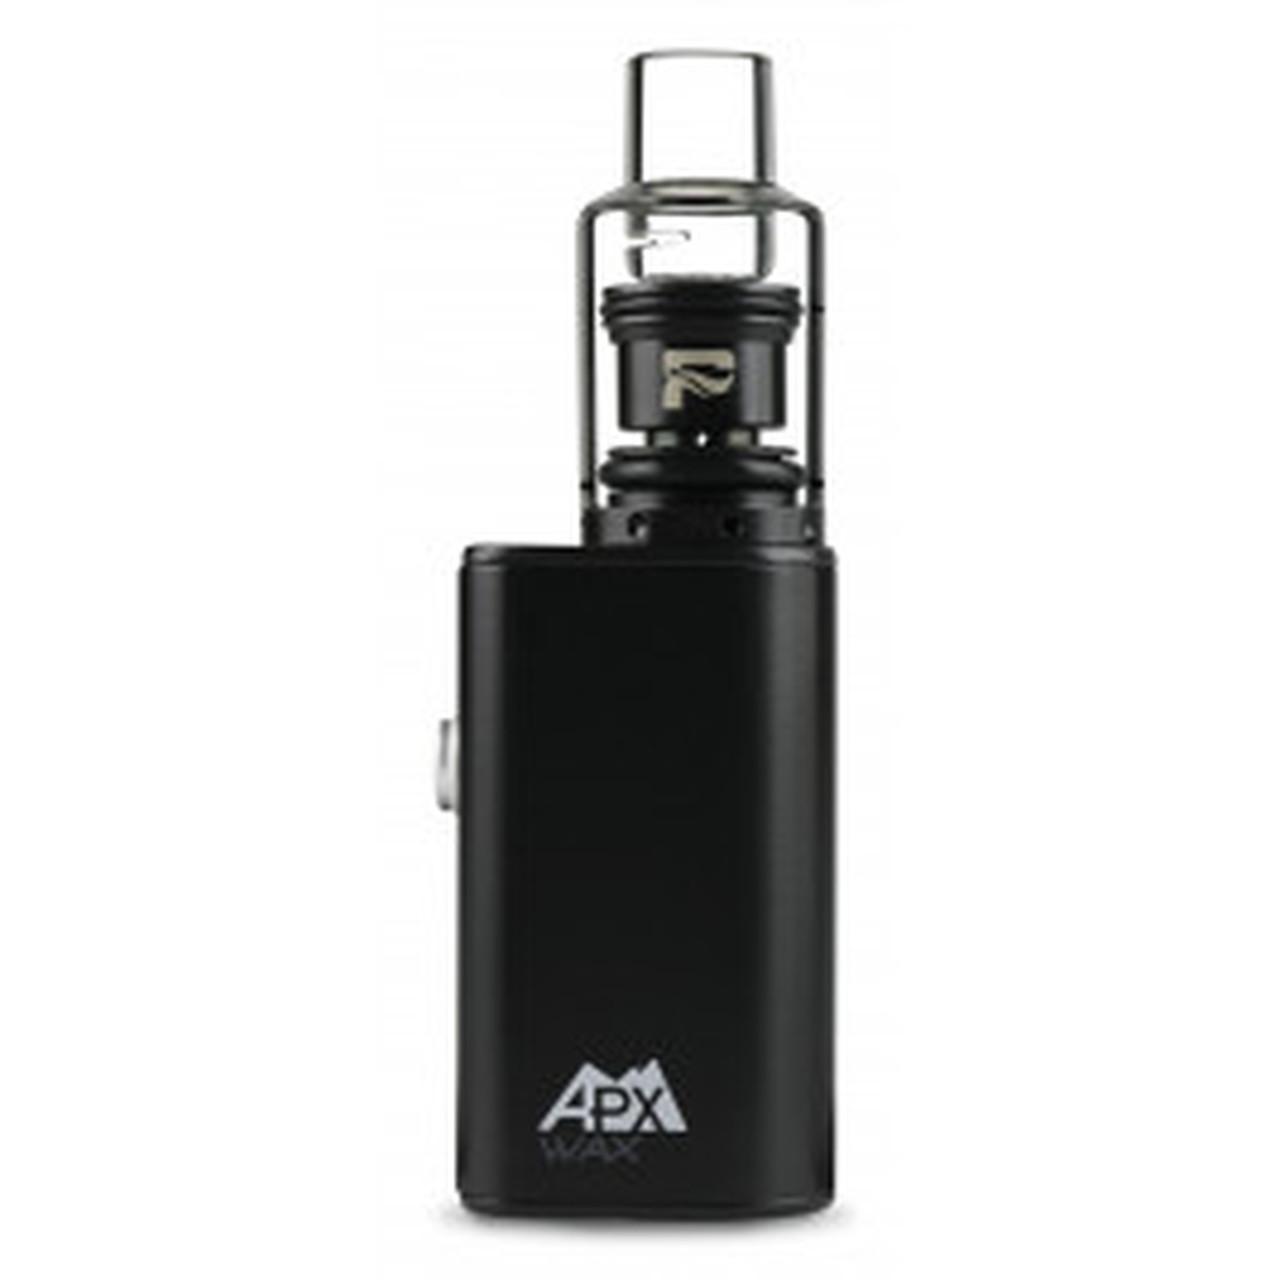 Pulsar Apx Wax Vaporizer